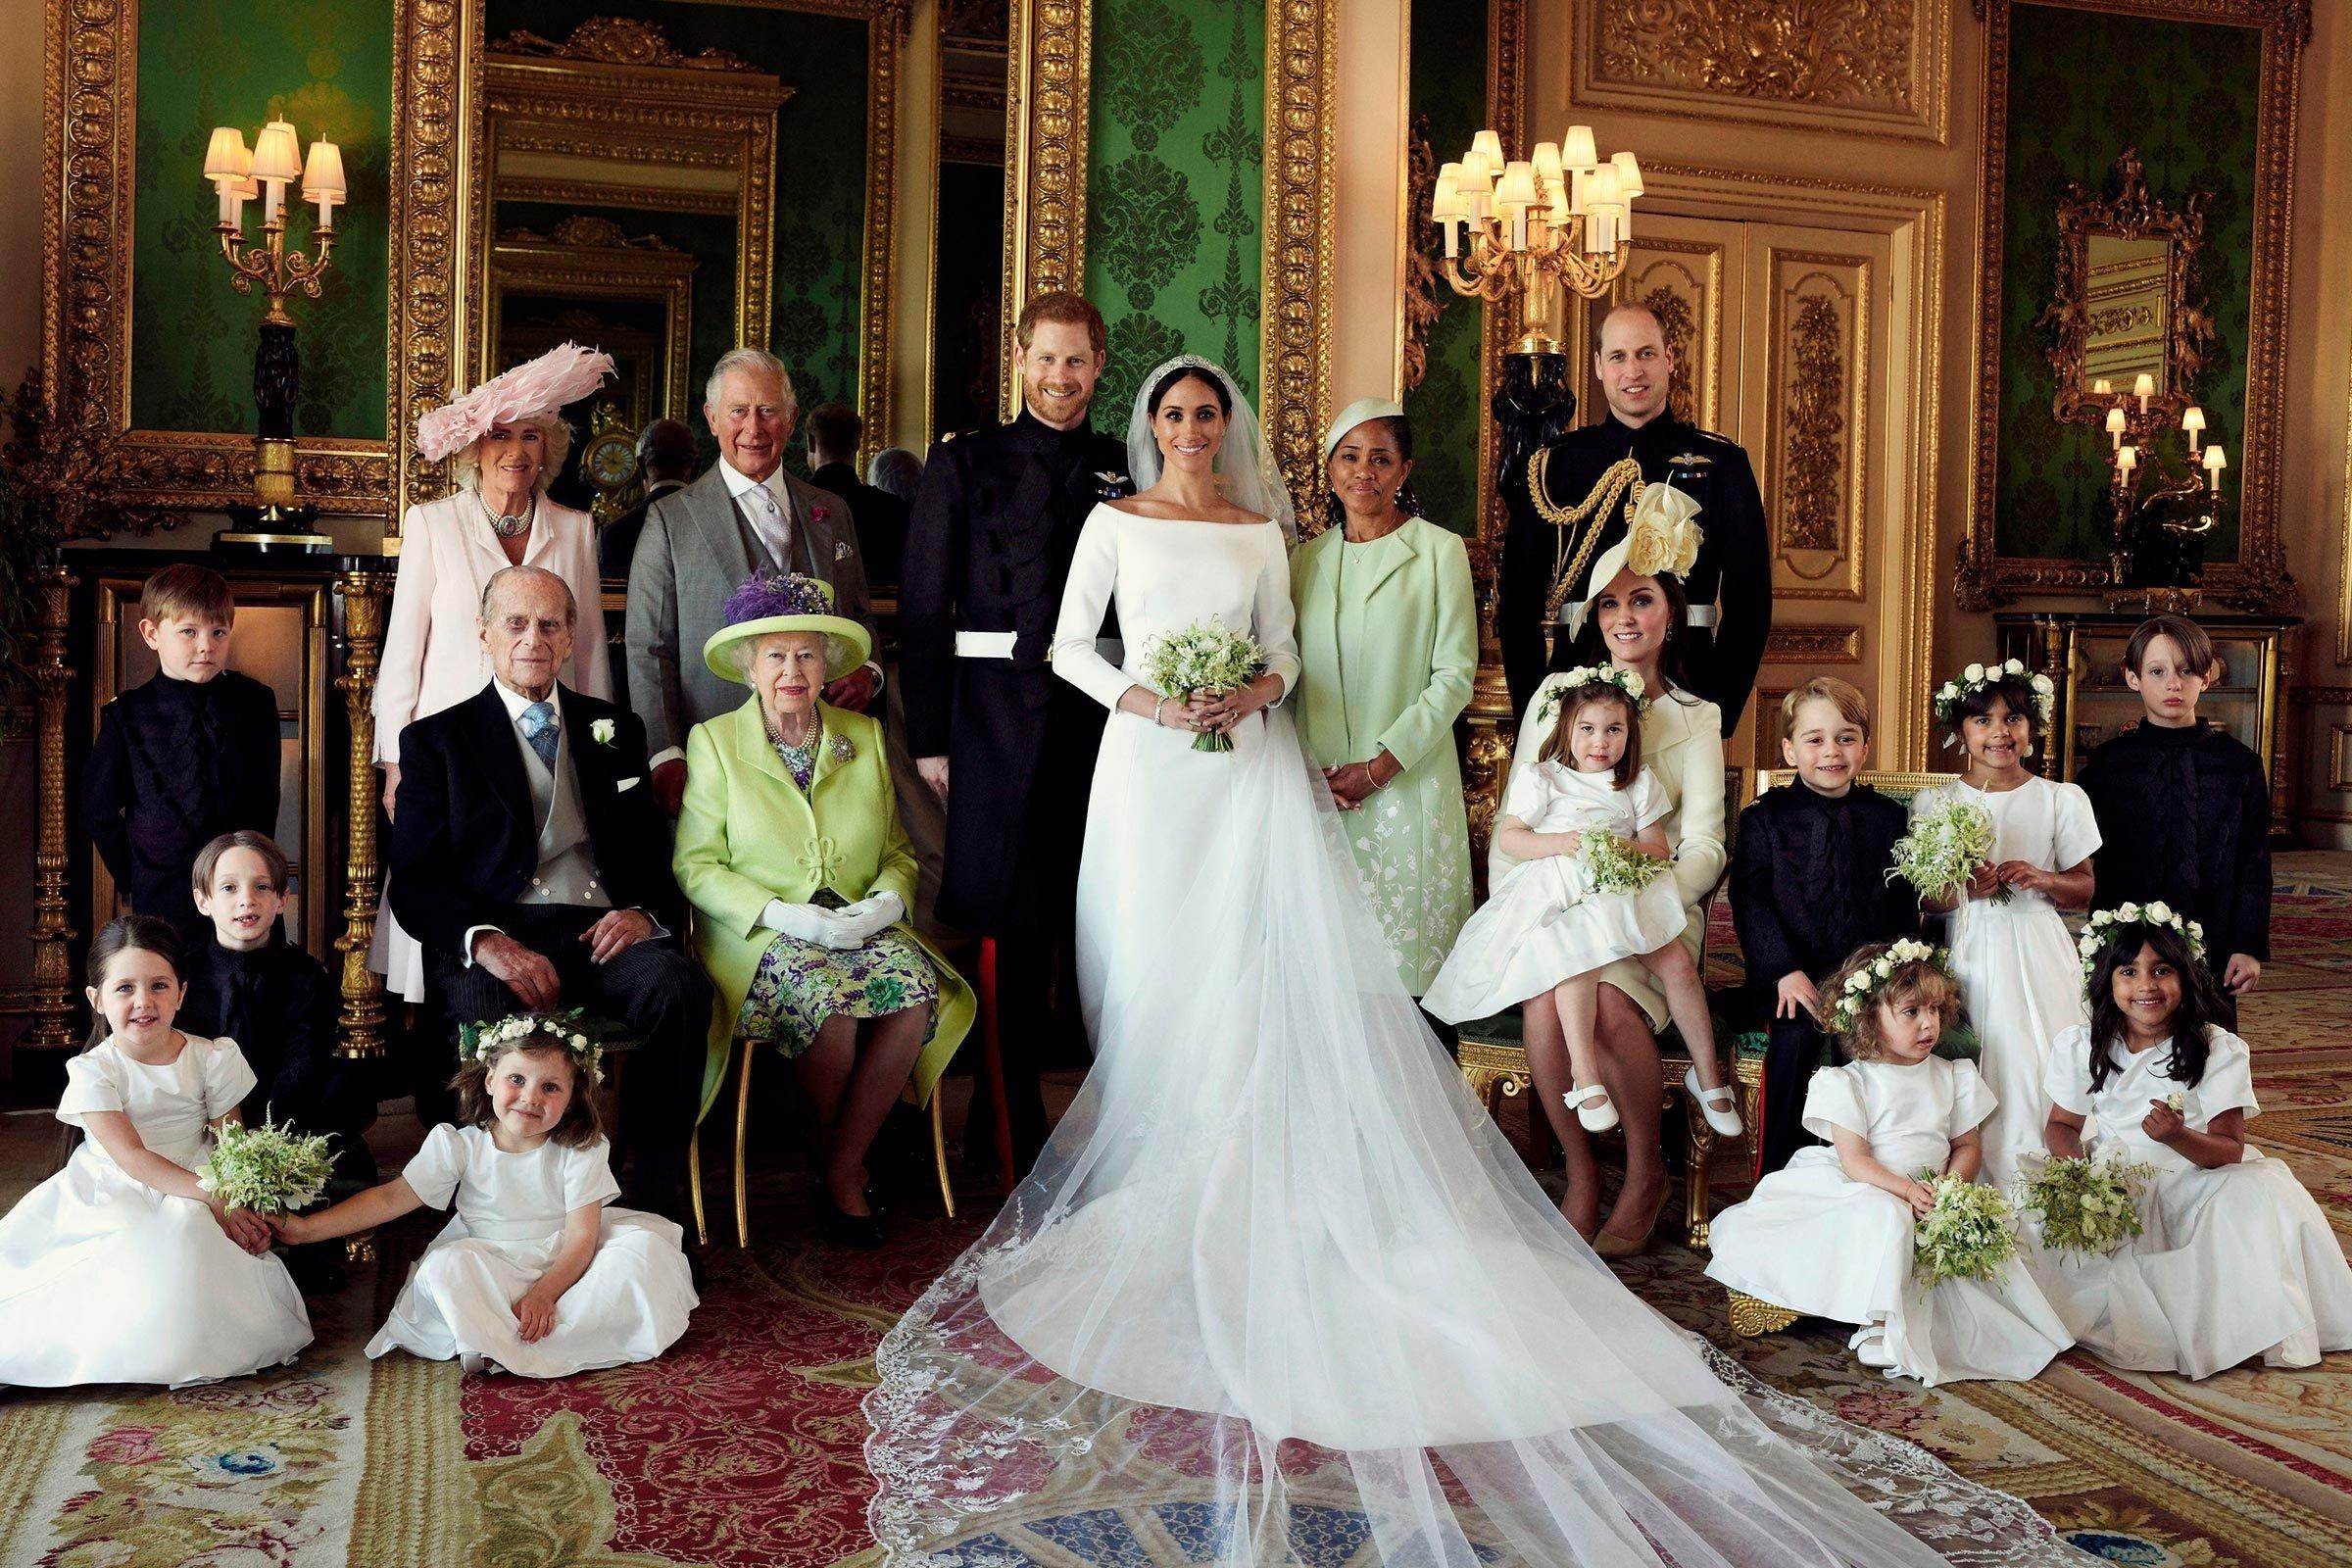 Meghan Markle's wedding look